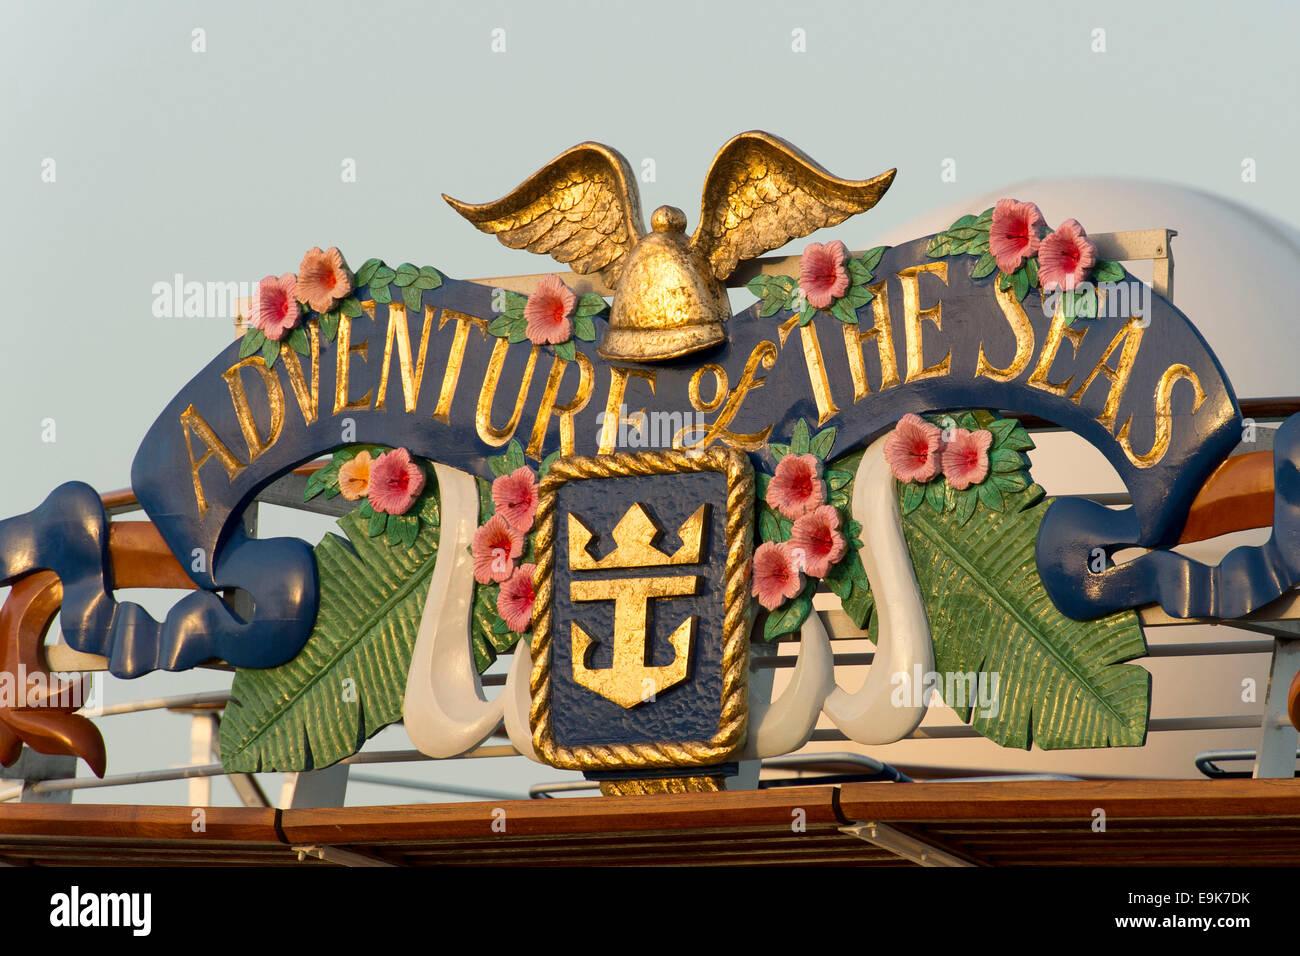 Royal Caribbean's Adventurer of the Seas ship sign logo. - Stock Image